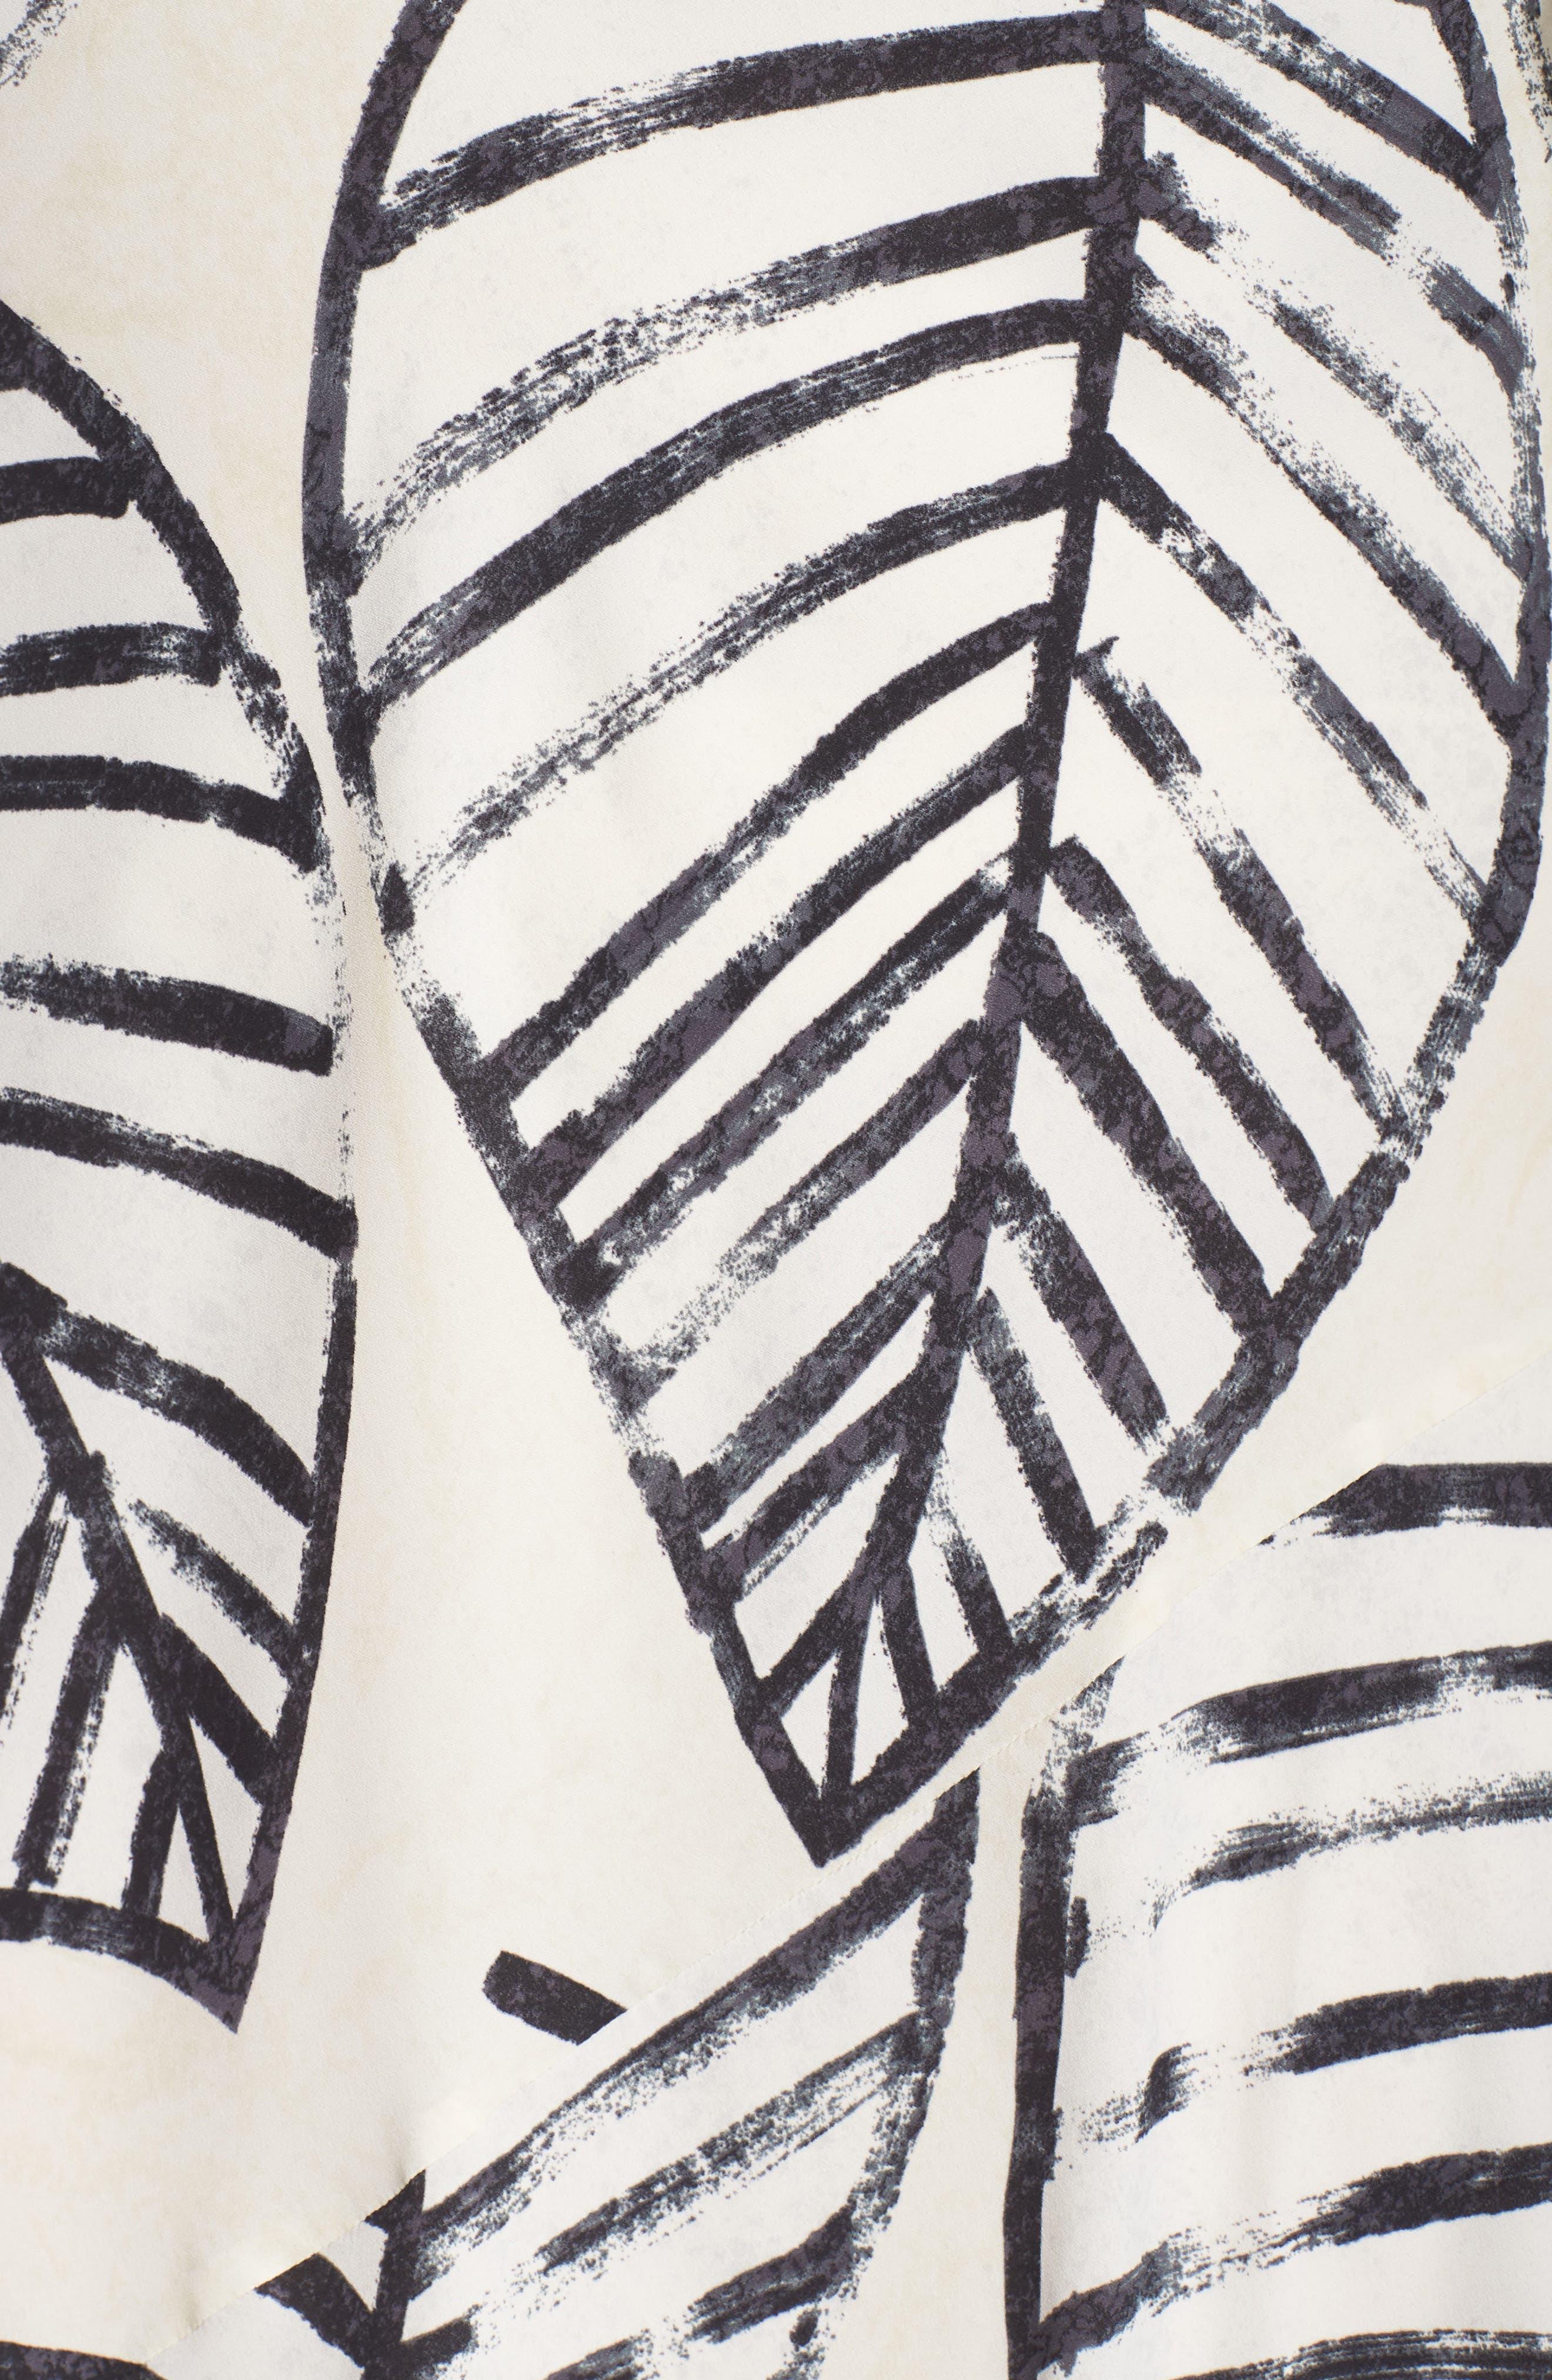 Etched Leaves Tie Dress,                             Alternate thumbnail 6, color,                             257